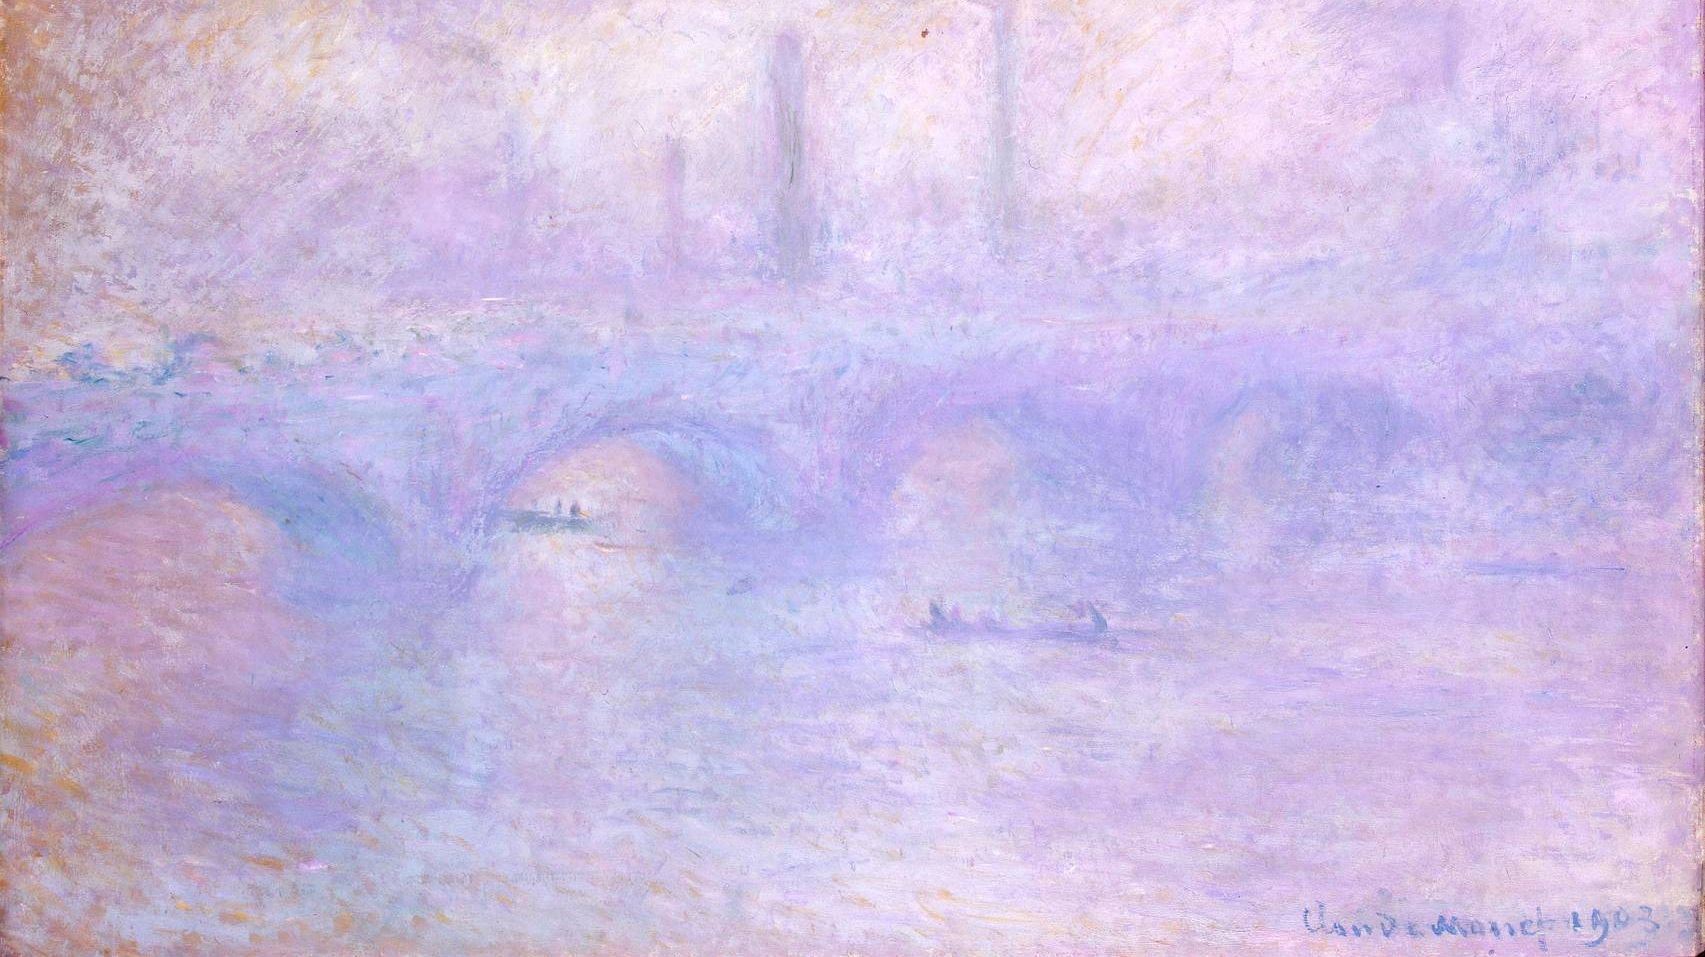 ������� ���� ��������. ������ ������ :: ���� ���� ( ������� ) - ���� ���� (Claude Monet) ����